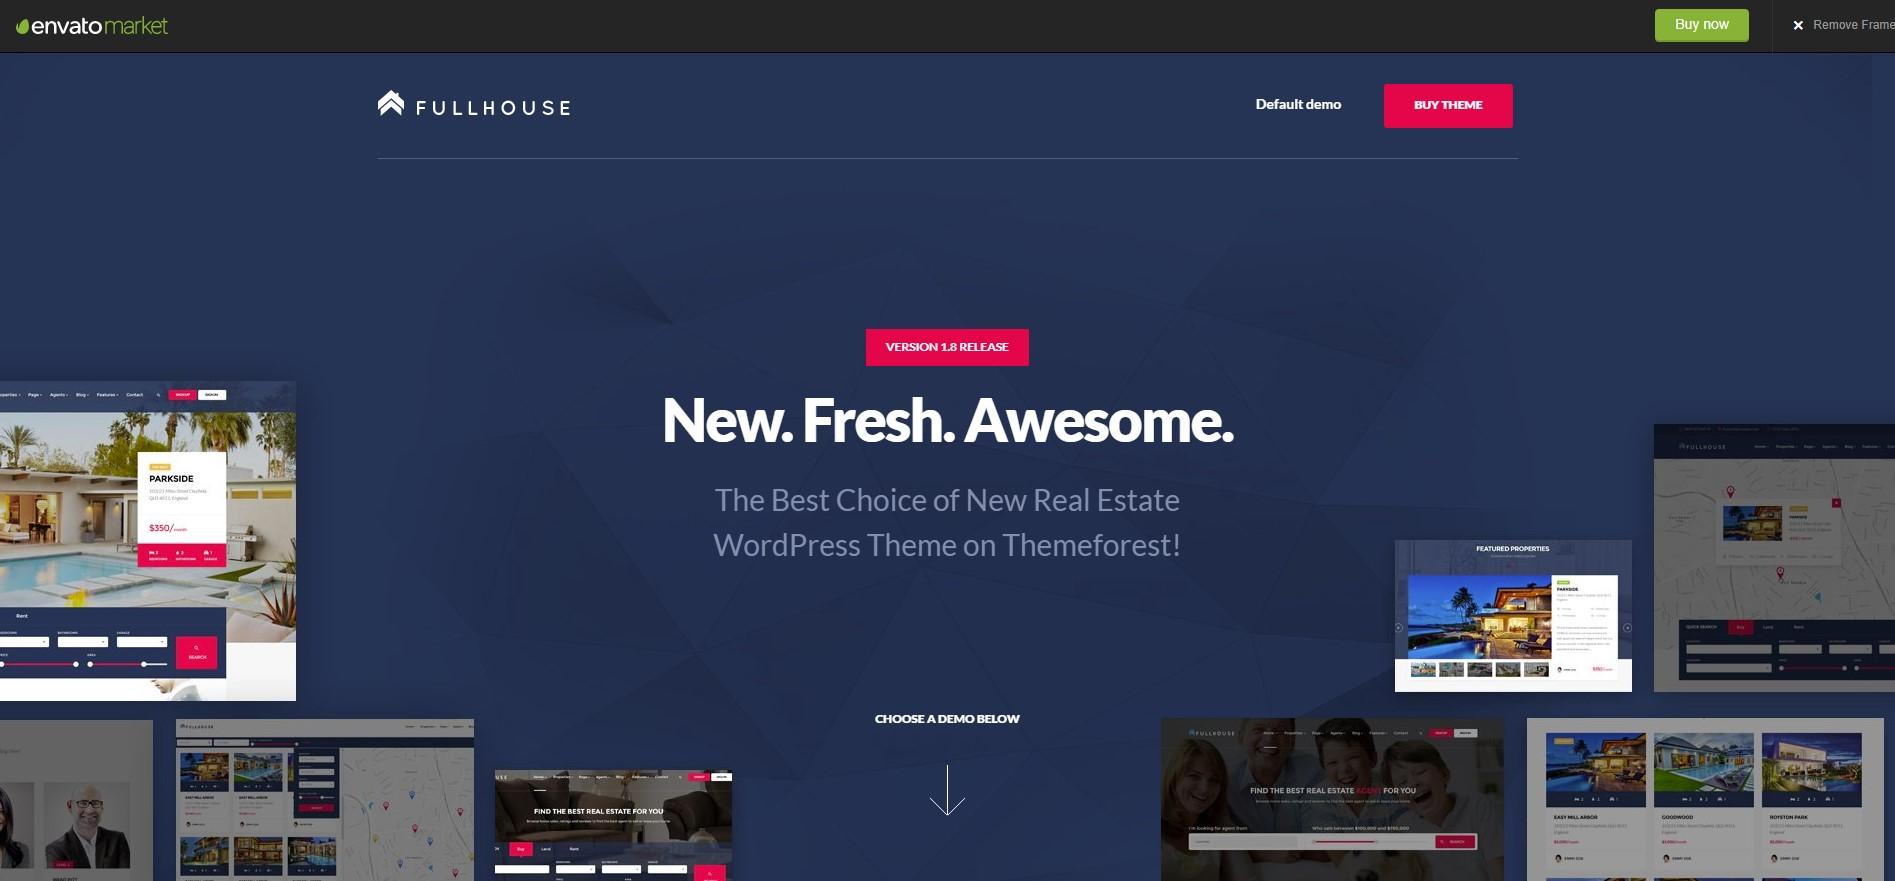 Fullhouse Real Estate WordPress Theme